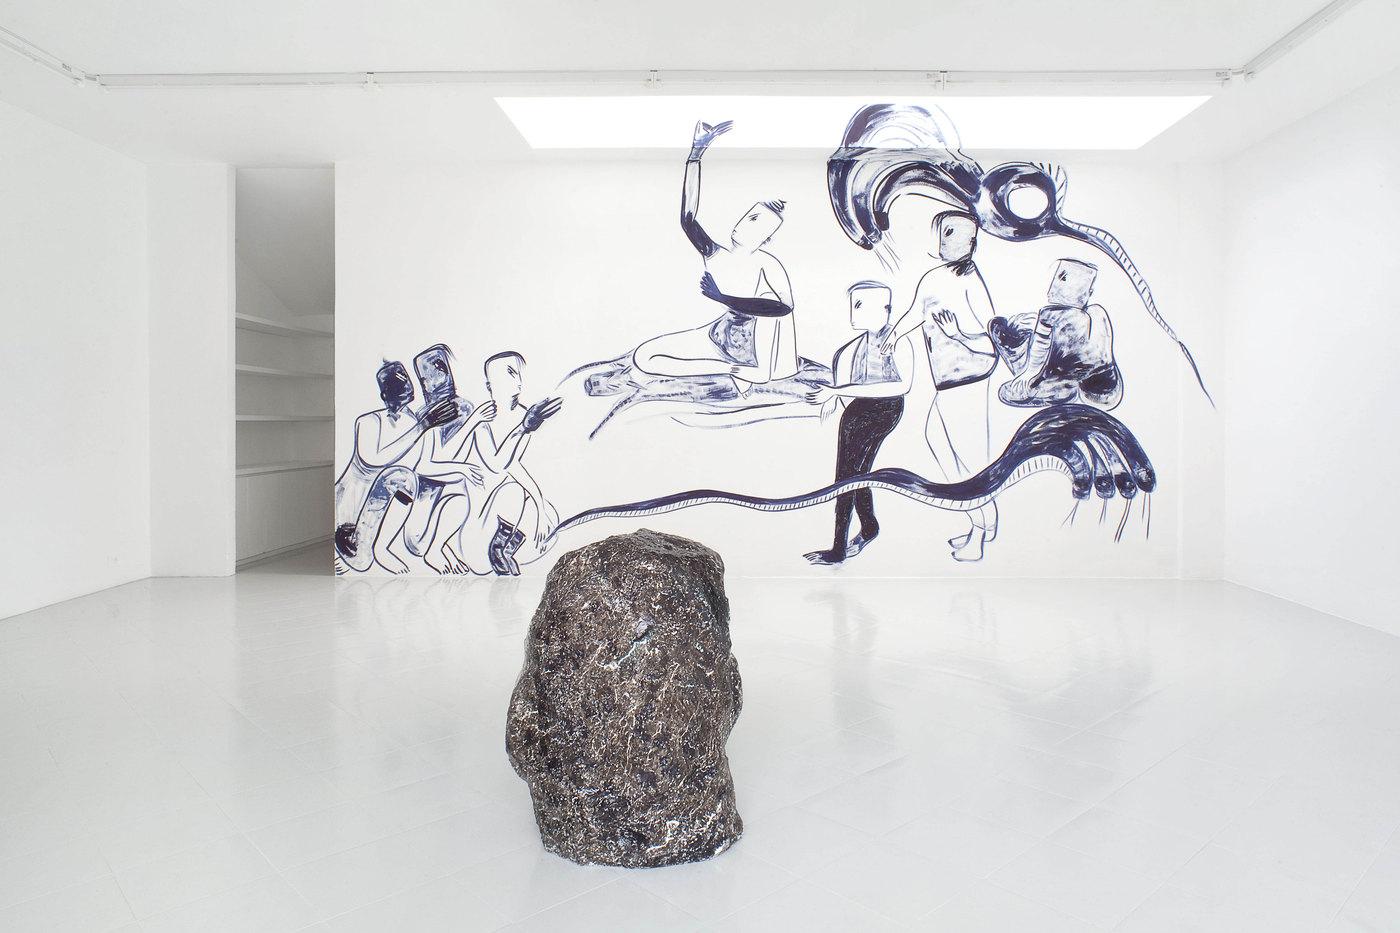 12 - Melike Kara, Lindsay Lawson, Installation View, 2016 - Courtesy Studiolo, Milan